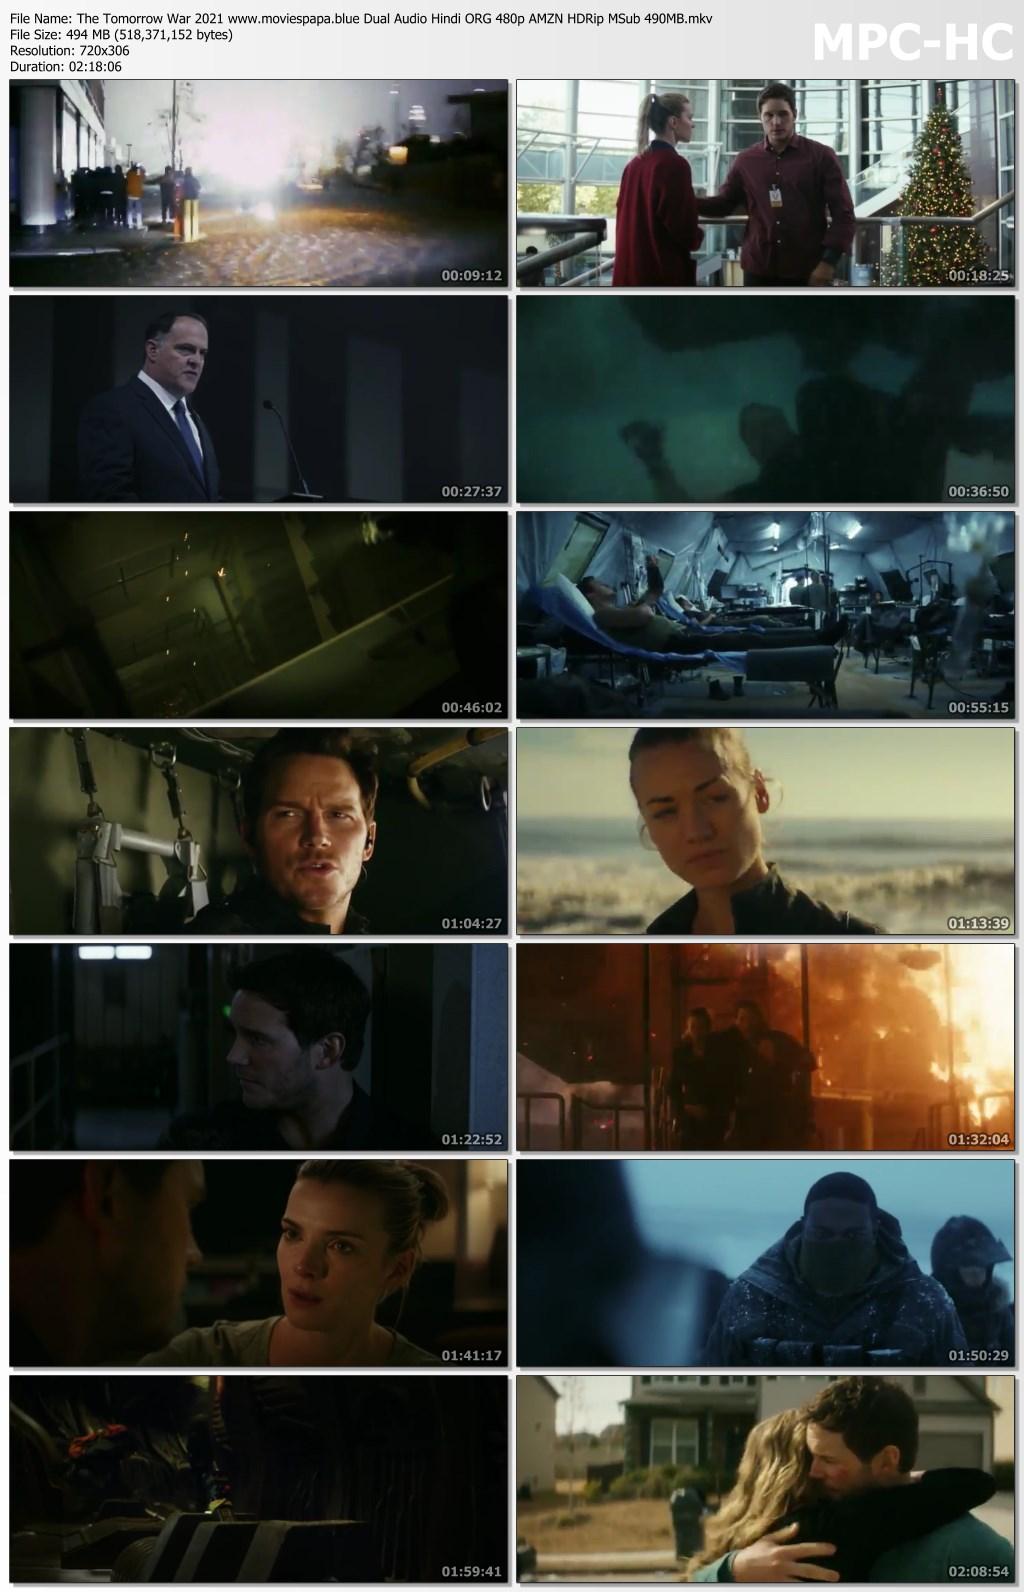 The Tomorrow War 2021 screenshot HDMoviesFair